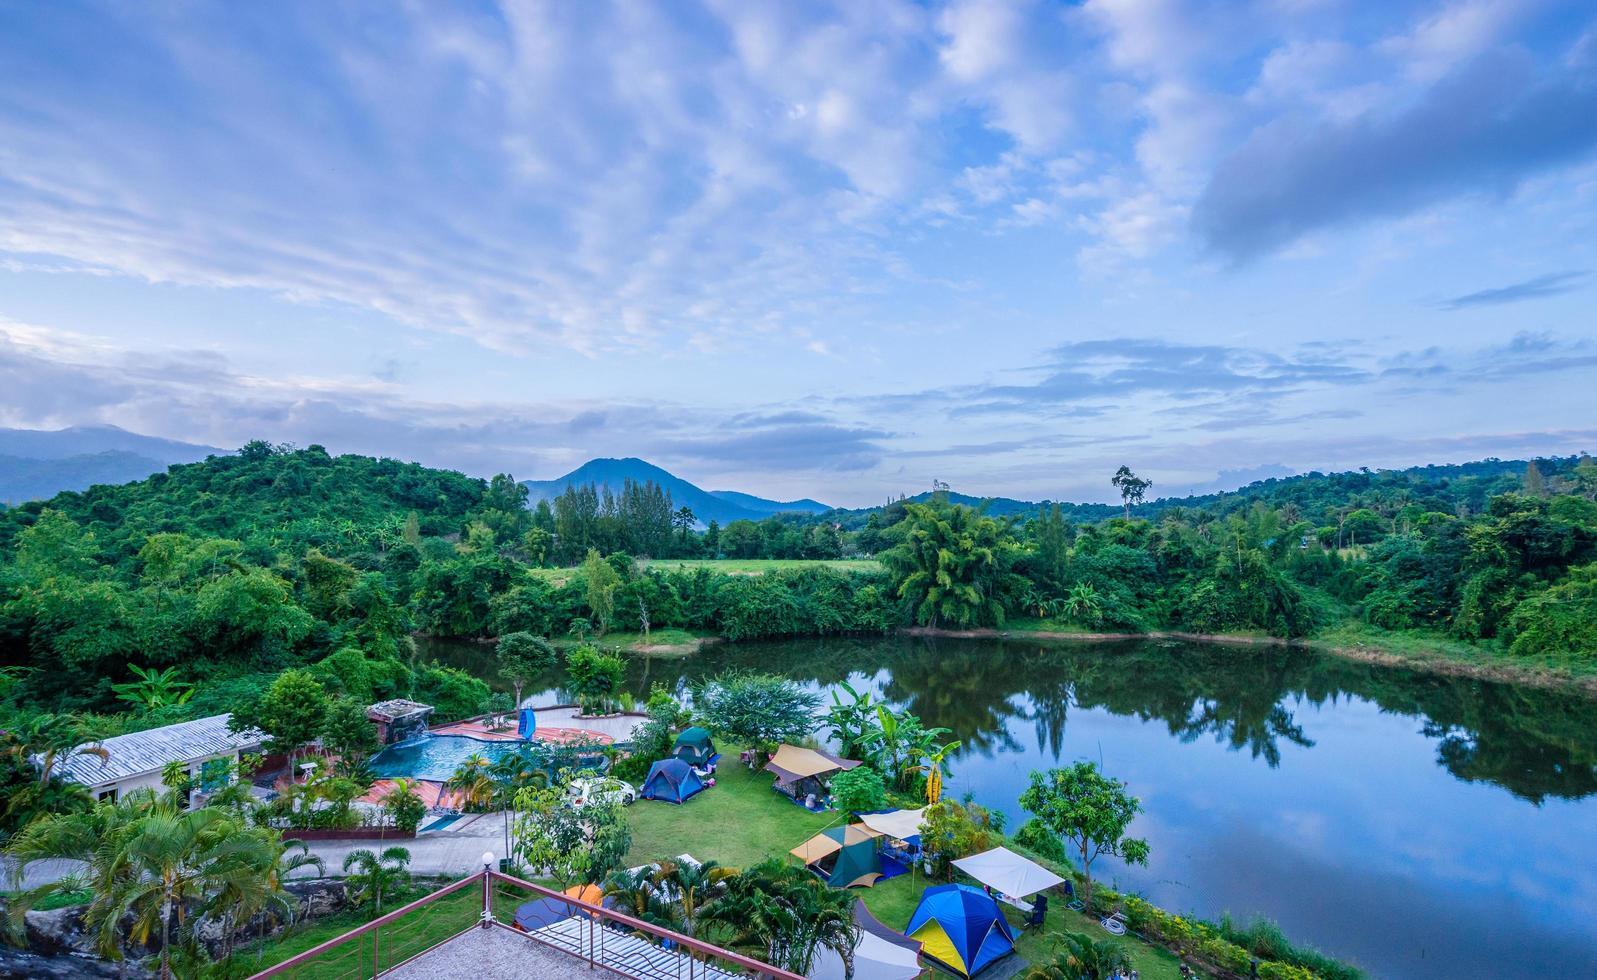 Campingplatz am Fluss foto